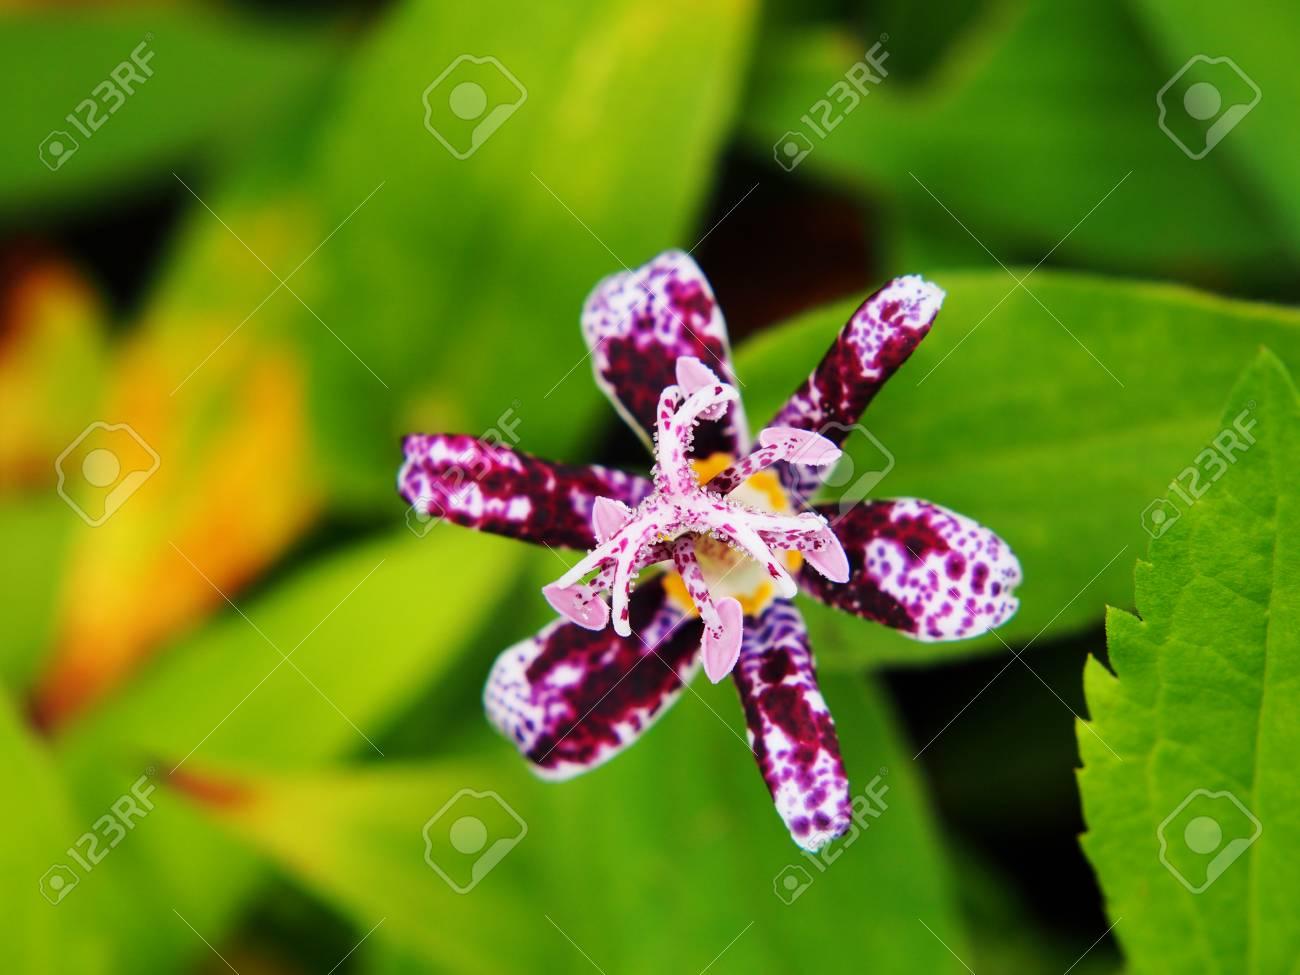 Tricyrtis hirta hairy toad lily stock photo picture and royalty tricyrtis hirta hairy toad lily stock photo 62545266 izmirmasajfo